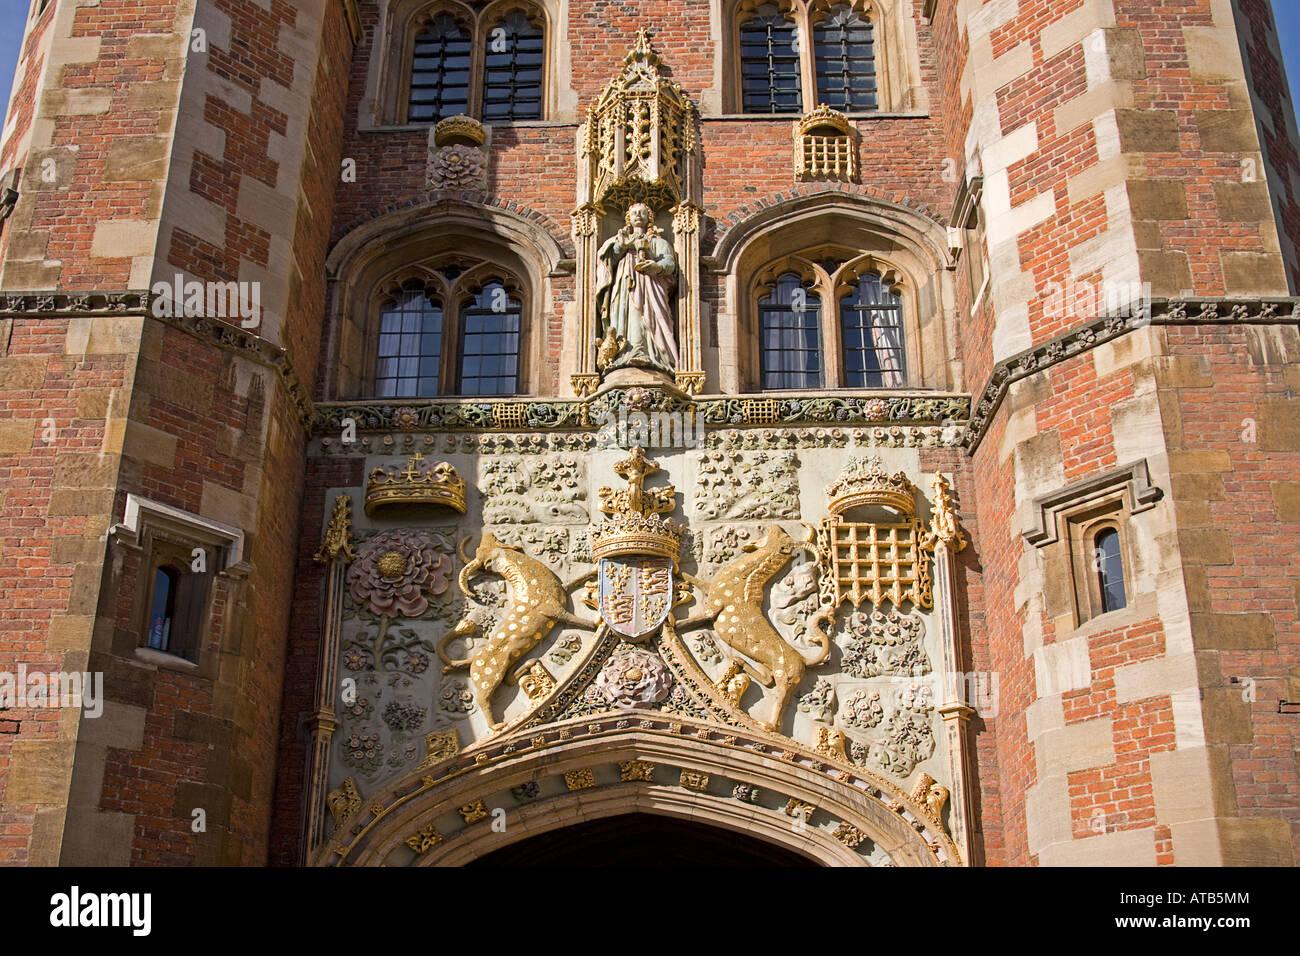 St John's College- main gate decoration, Cambridge,Cambridgeshire. East Anglia. UK. - Stock Image